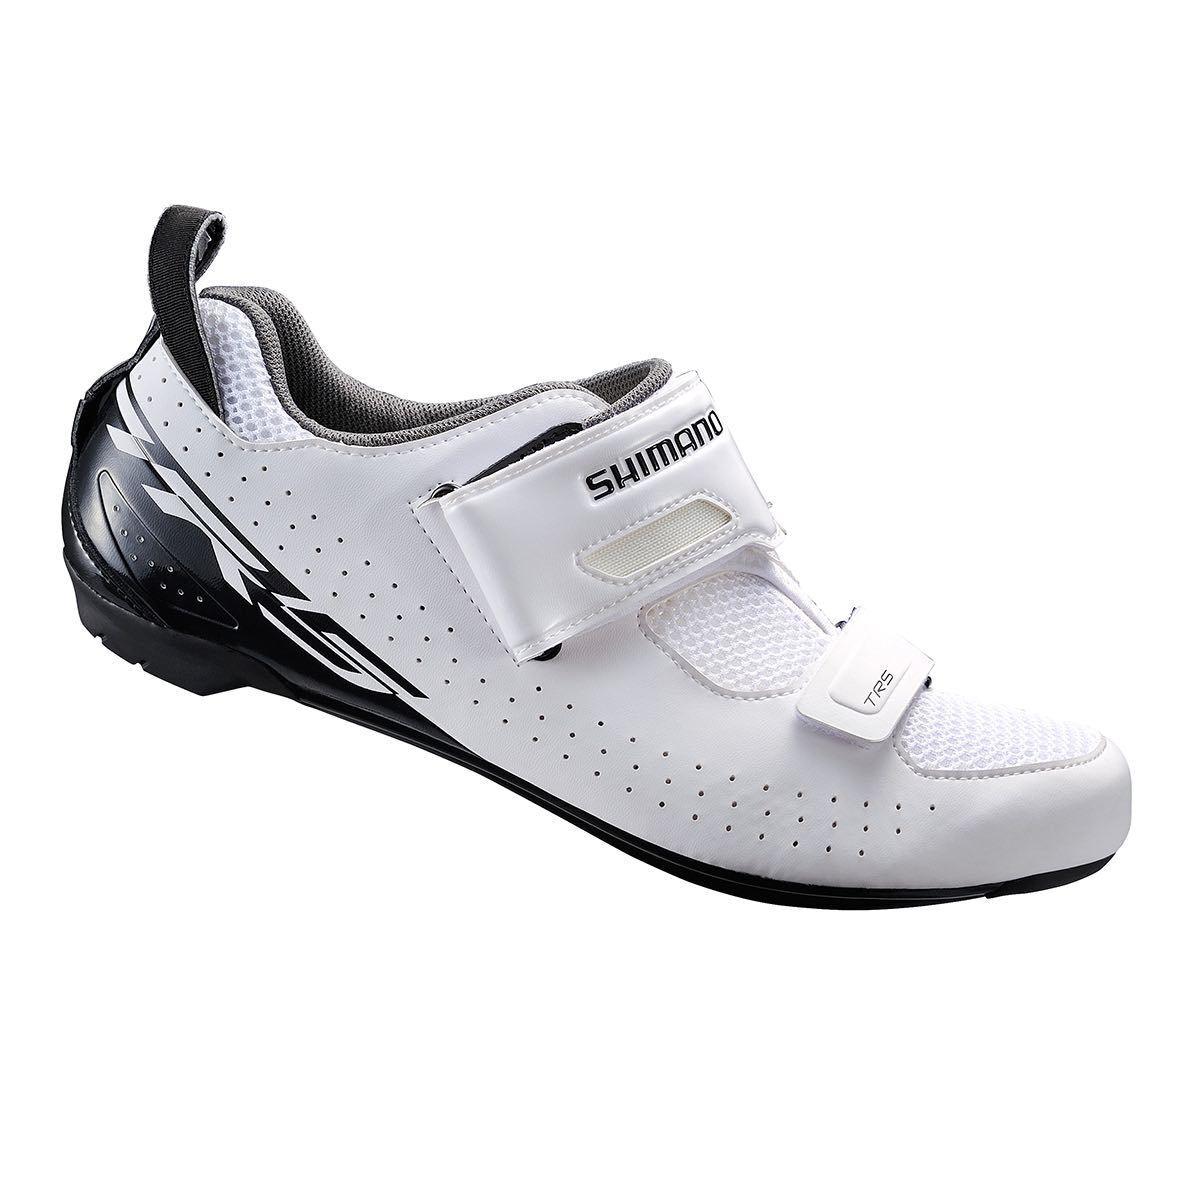 Shimano SH-TR5 Herren Triathlon Schuhes Performance Cycling Road Bike  Herren SH-TR5 Weiß 2aff3f